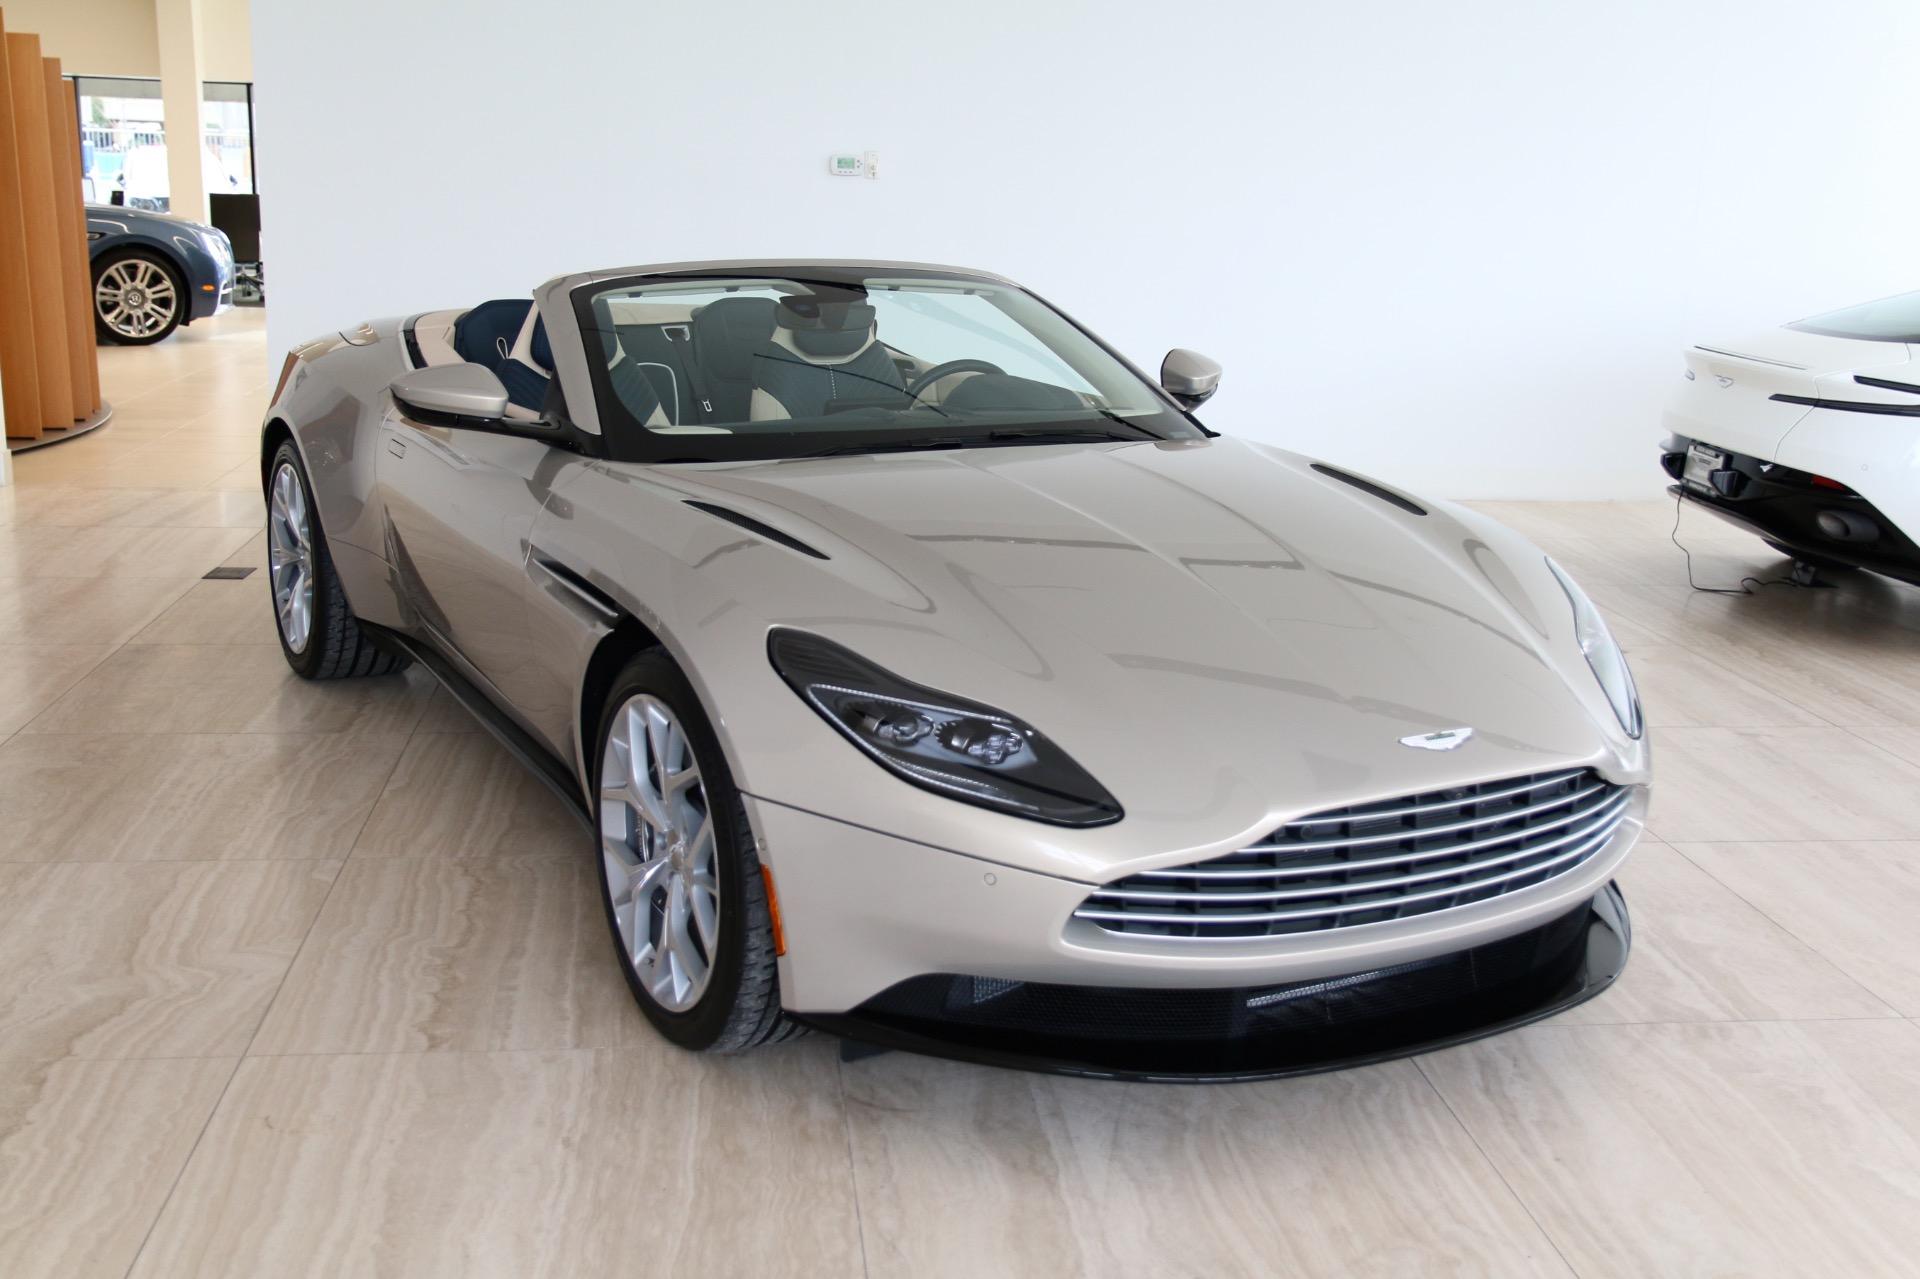 2019 Aston Martin Db11 V8 Volante Call To Order Stock 9nx82136 For Sale Near Vienna Va Va Aston Martin Dealer